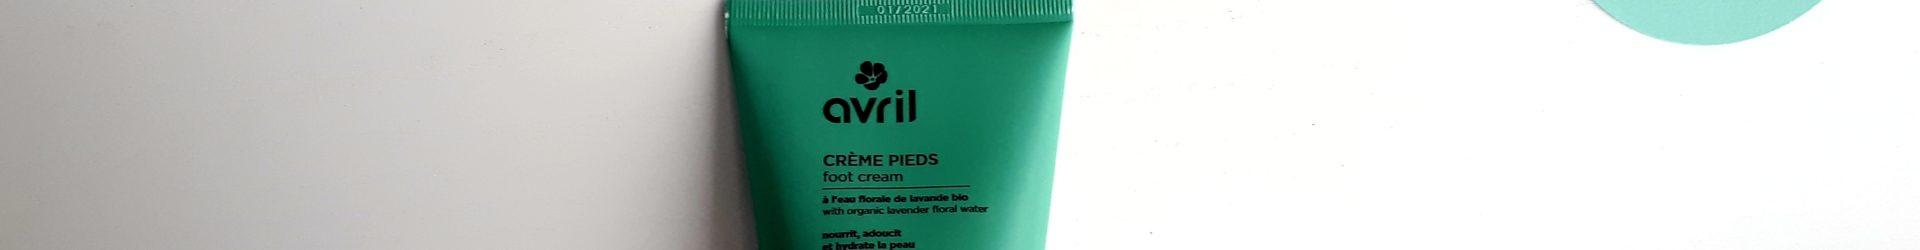 Avril – Crème pieds bio (100ml)